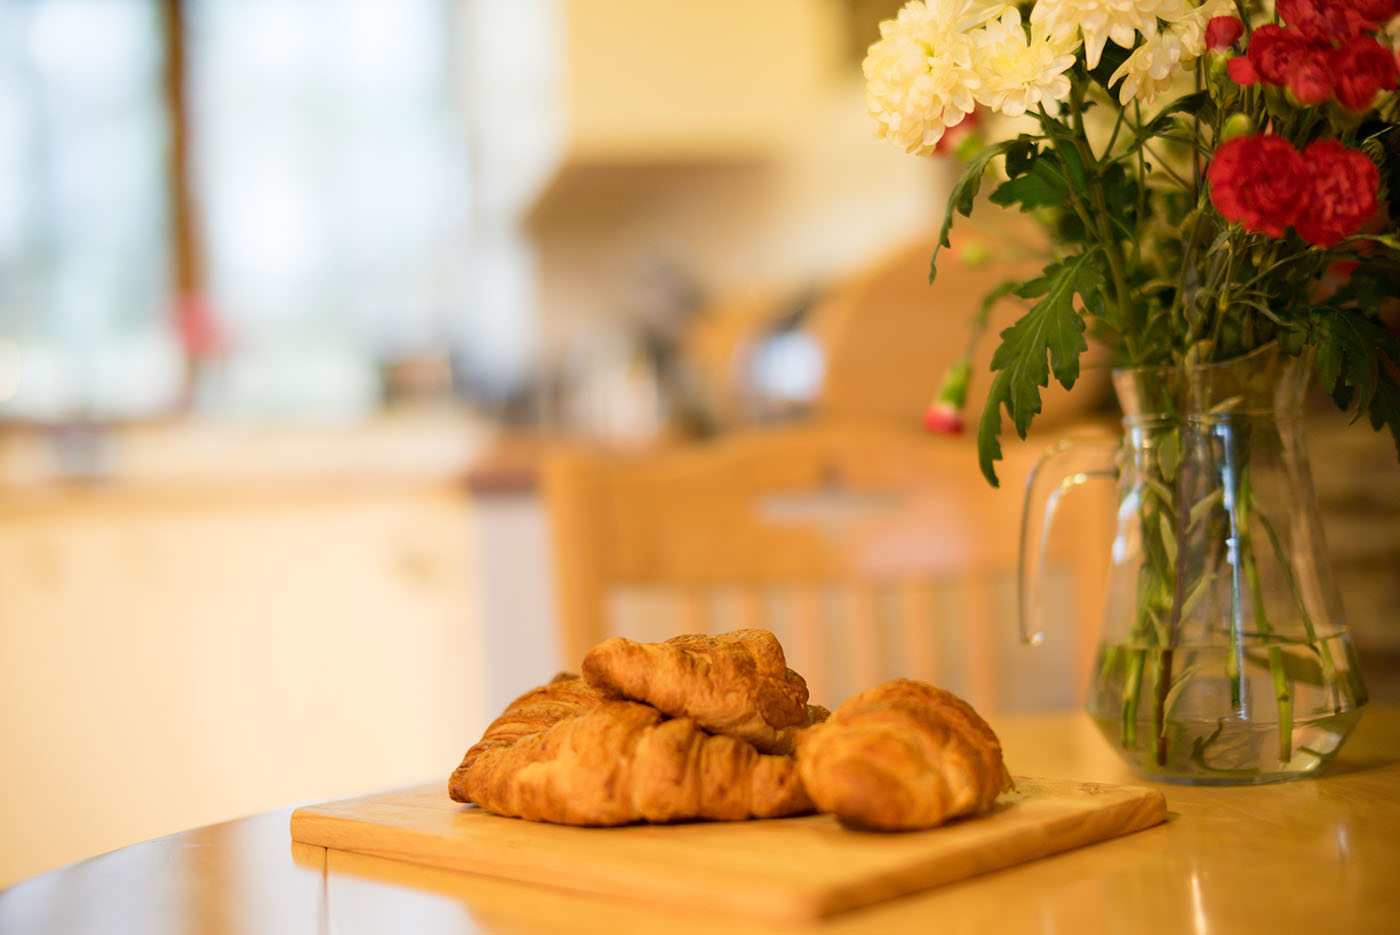 Linhay croissants